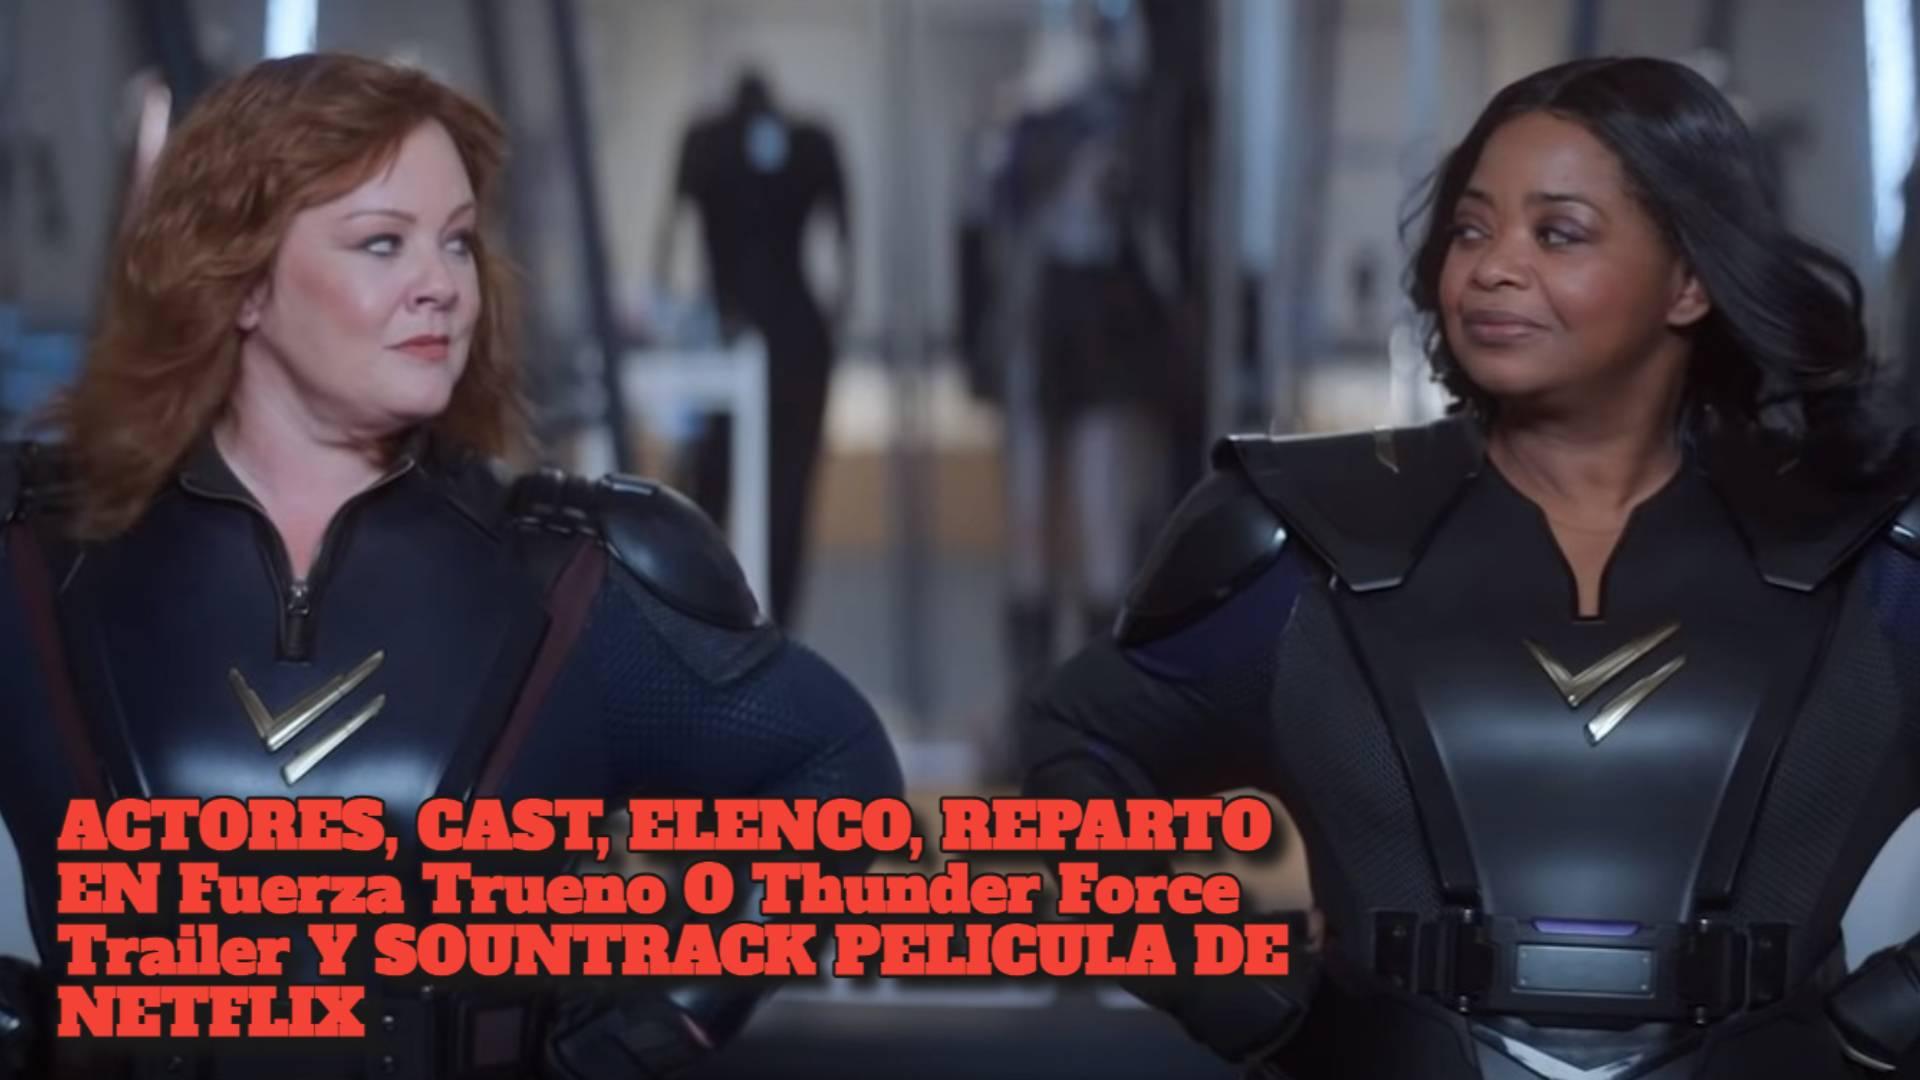 ACTORES, CAST, ELENCO, REPARTO EN Fuerza Trueno O Thunder Force